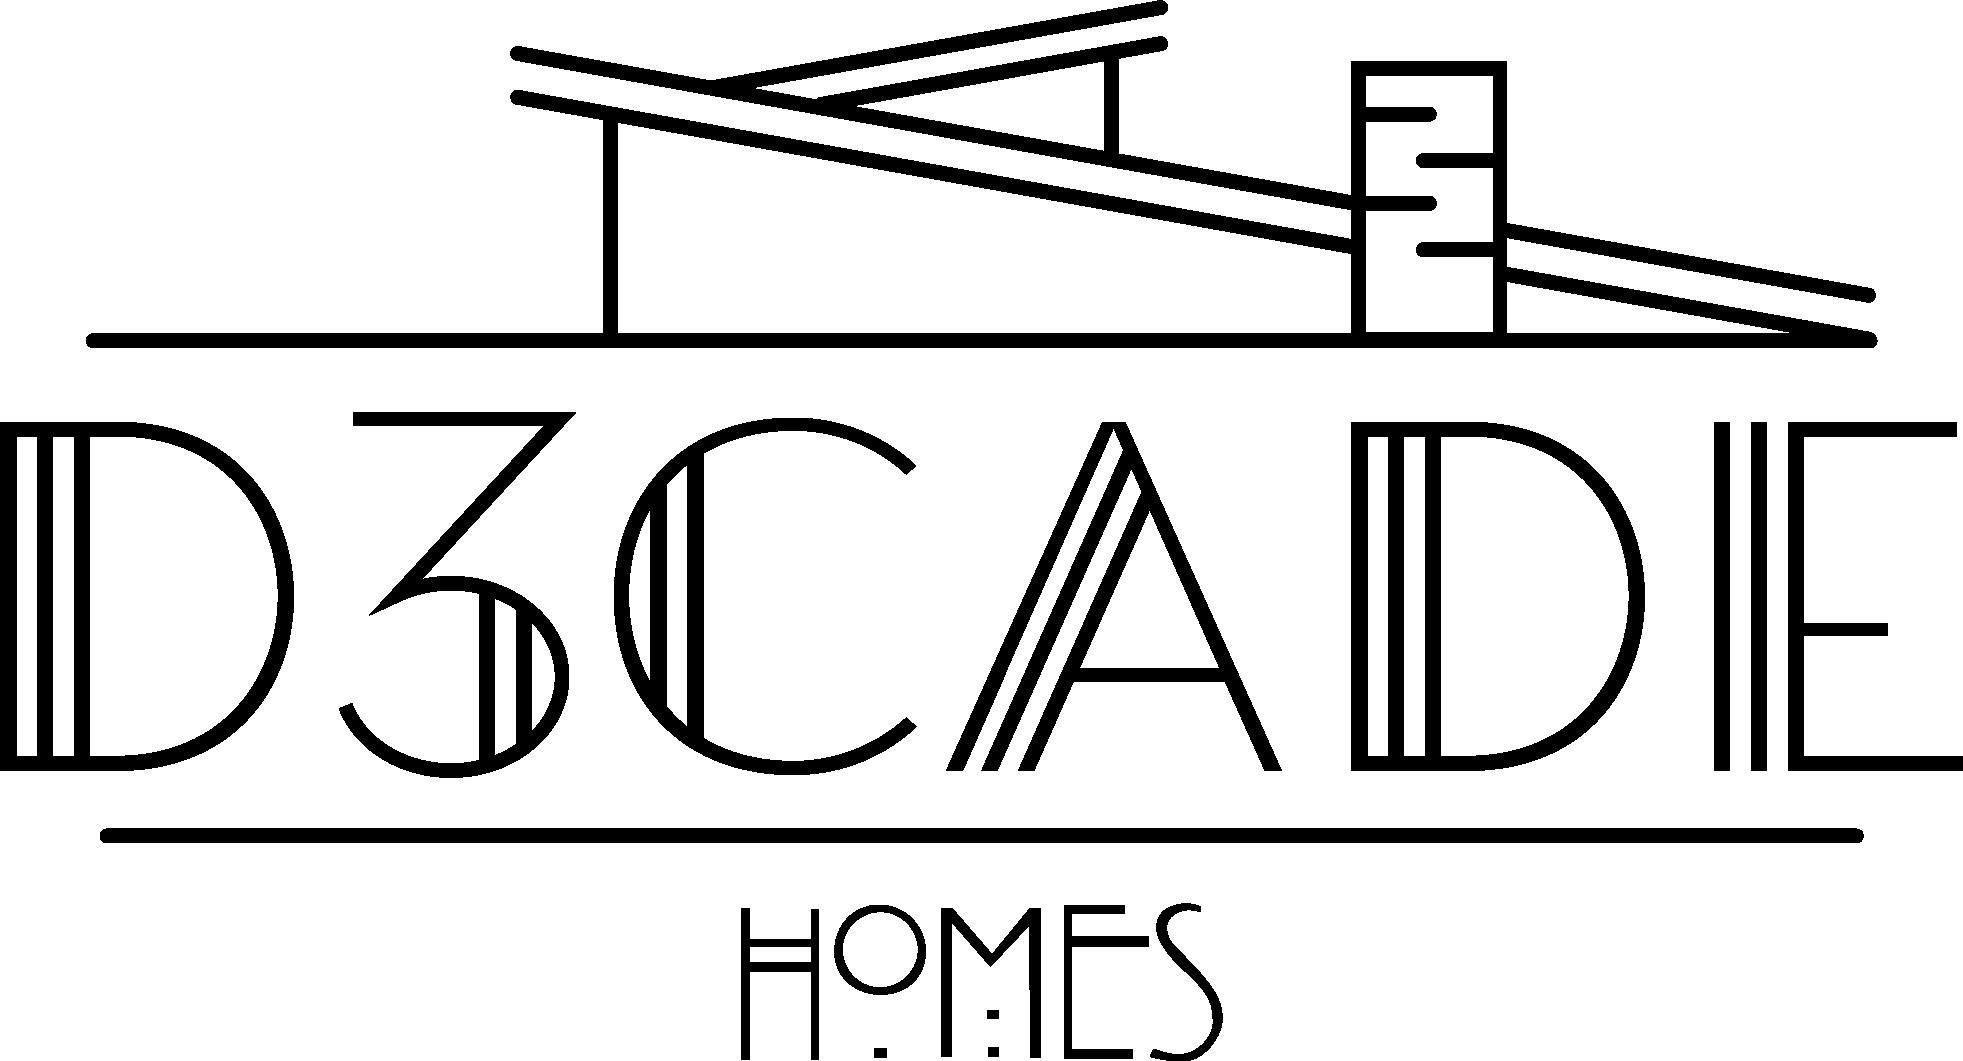 D3CADE_Logo Black